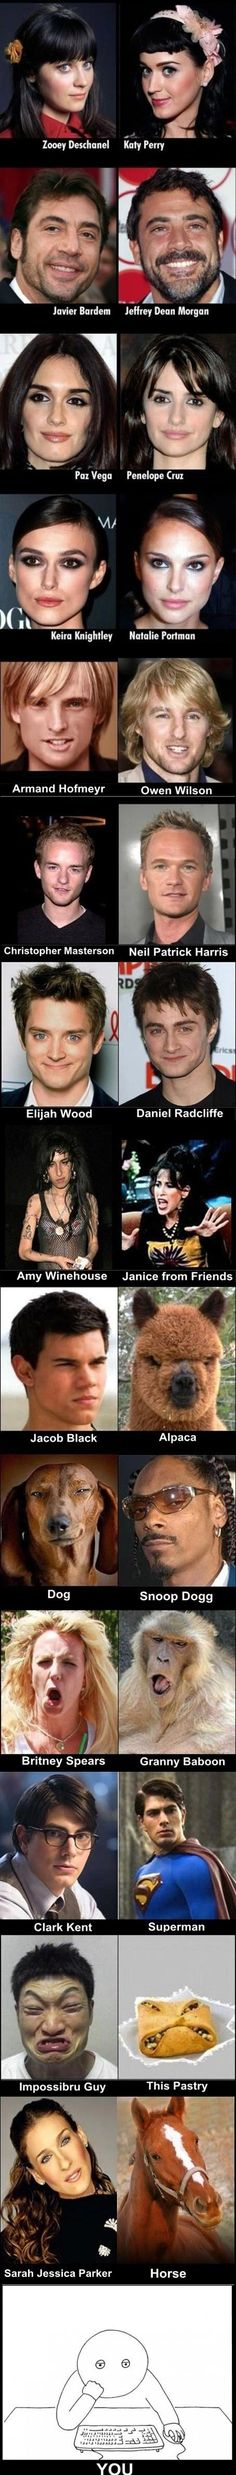 Celebrity lookalikes….